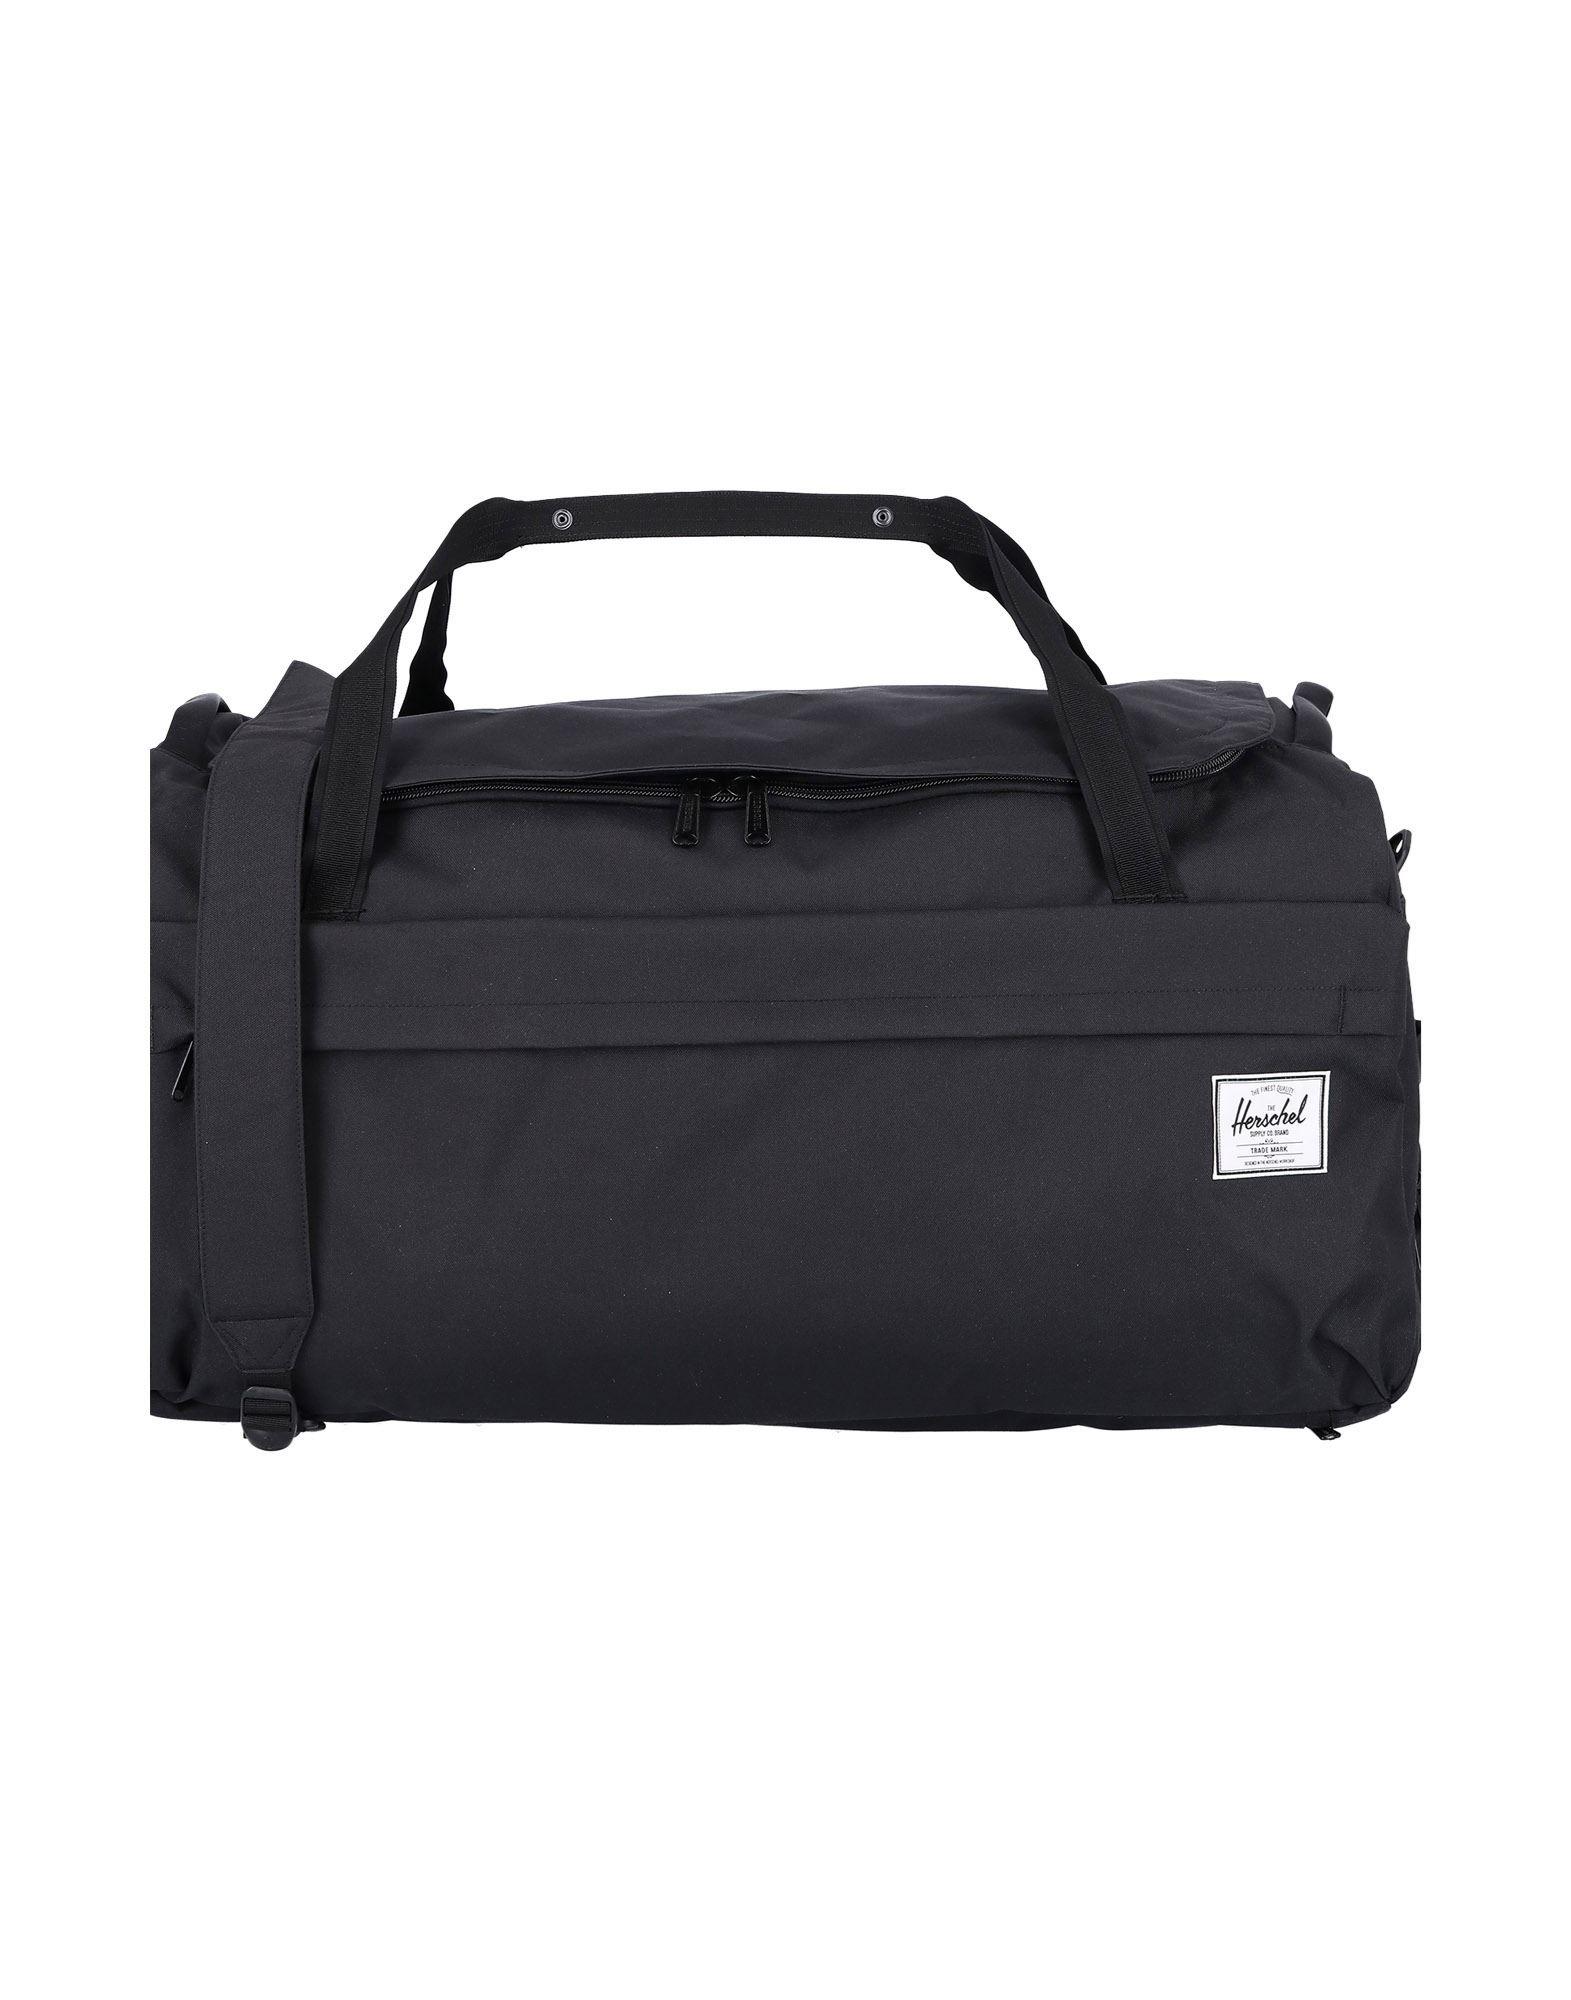 HERSCHEL SUPPLY CO. ハーシェル サプライ メンズ スーツケース ブラック - ミリタリーグリーン